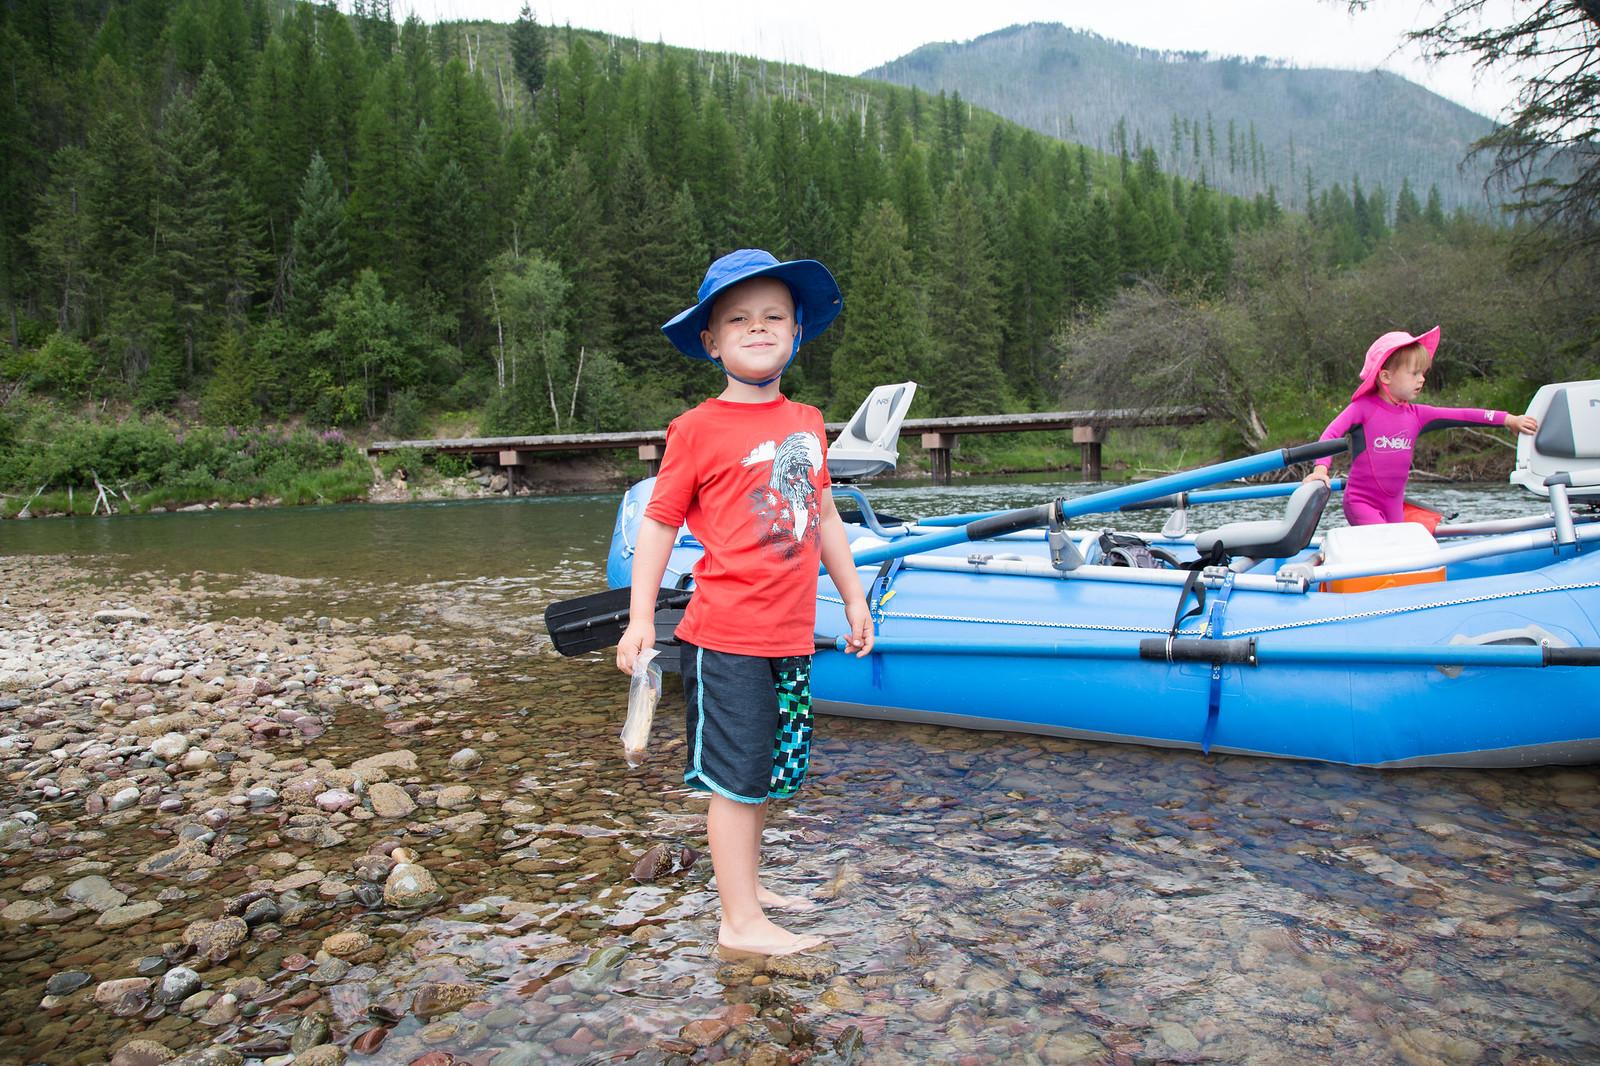 2015-07-10 Whitefish KOA and Float-9936.jpg